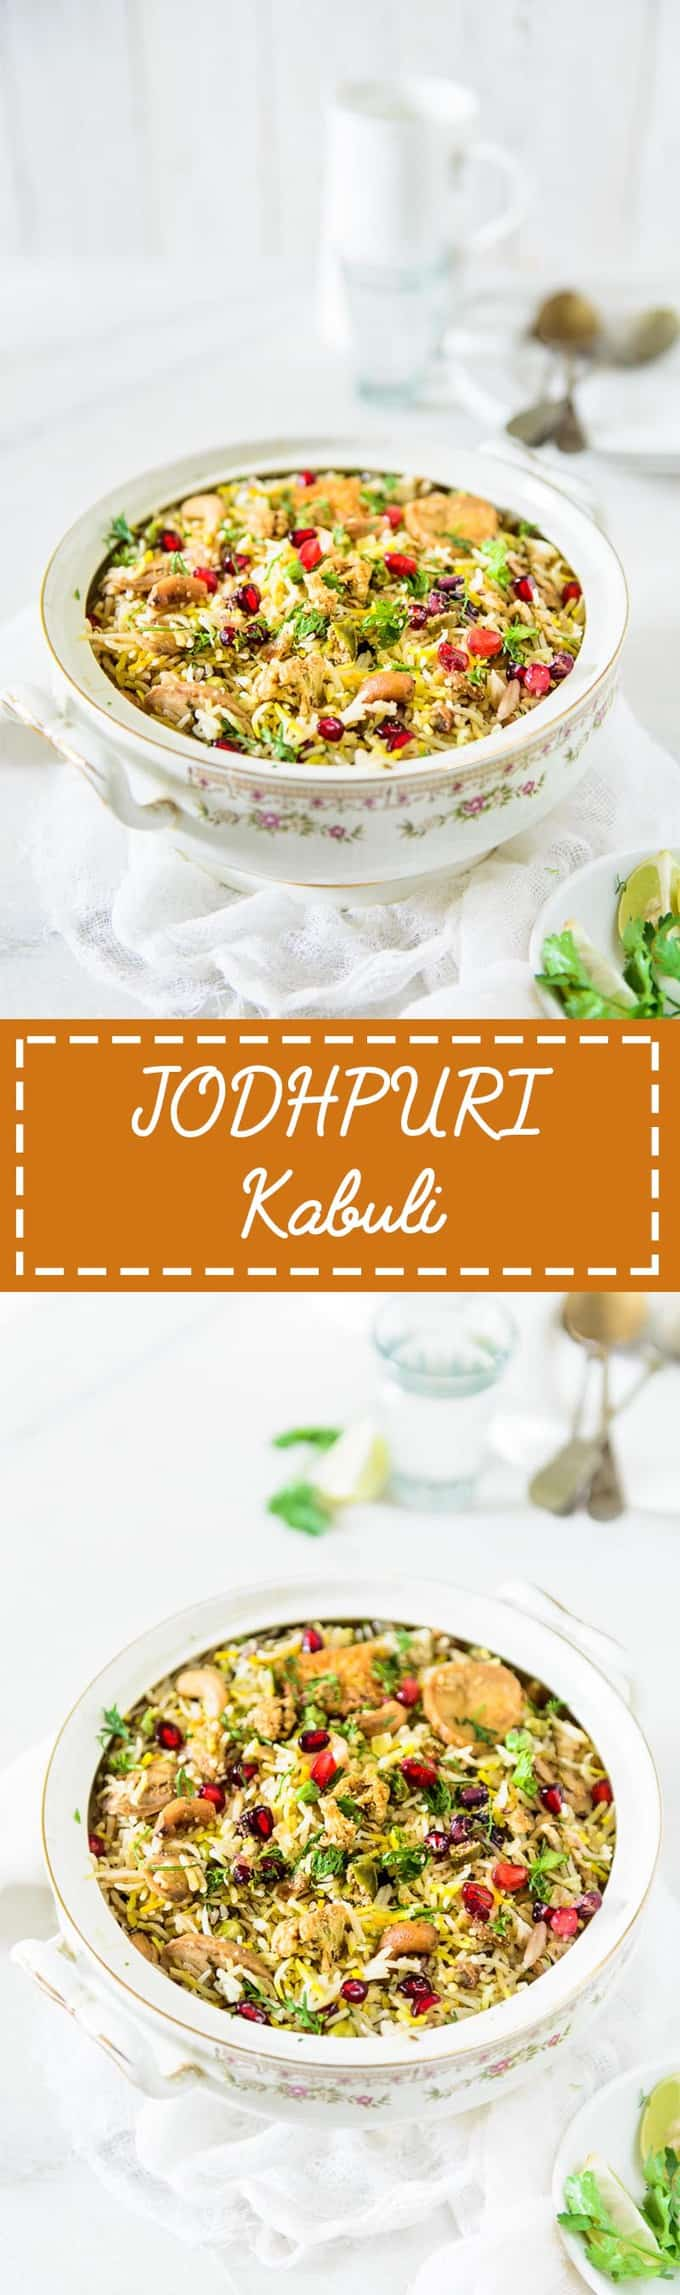 Jodhpuri Kabuli